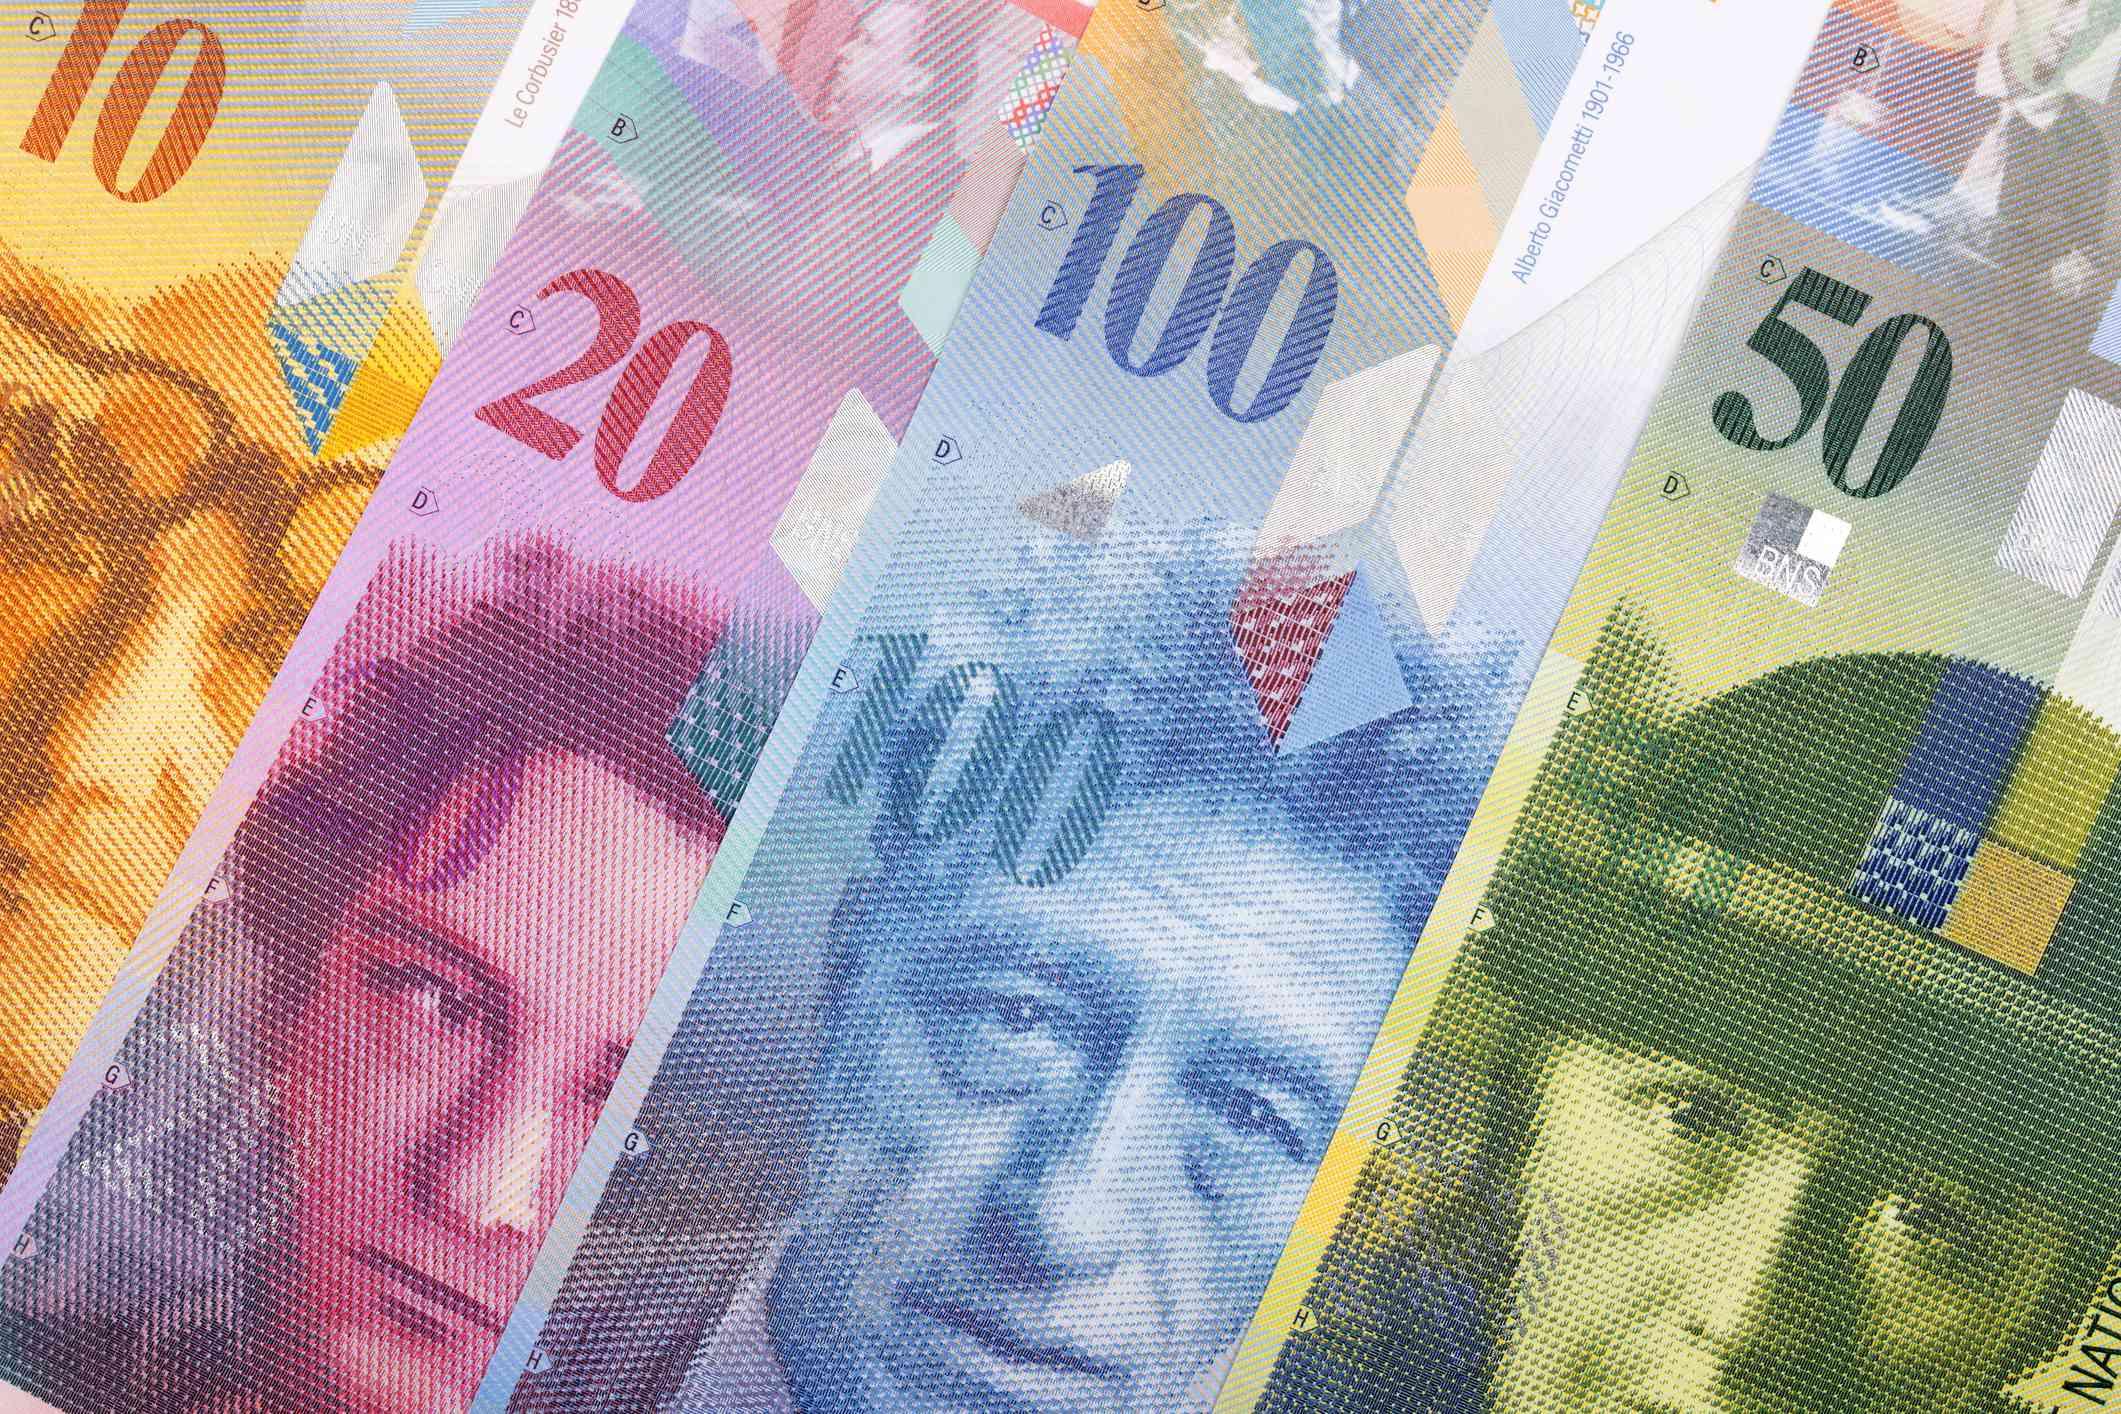 Swiss Franc Series 8